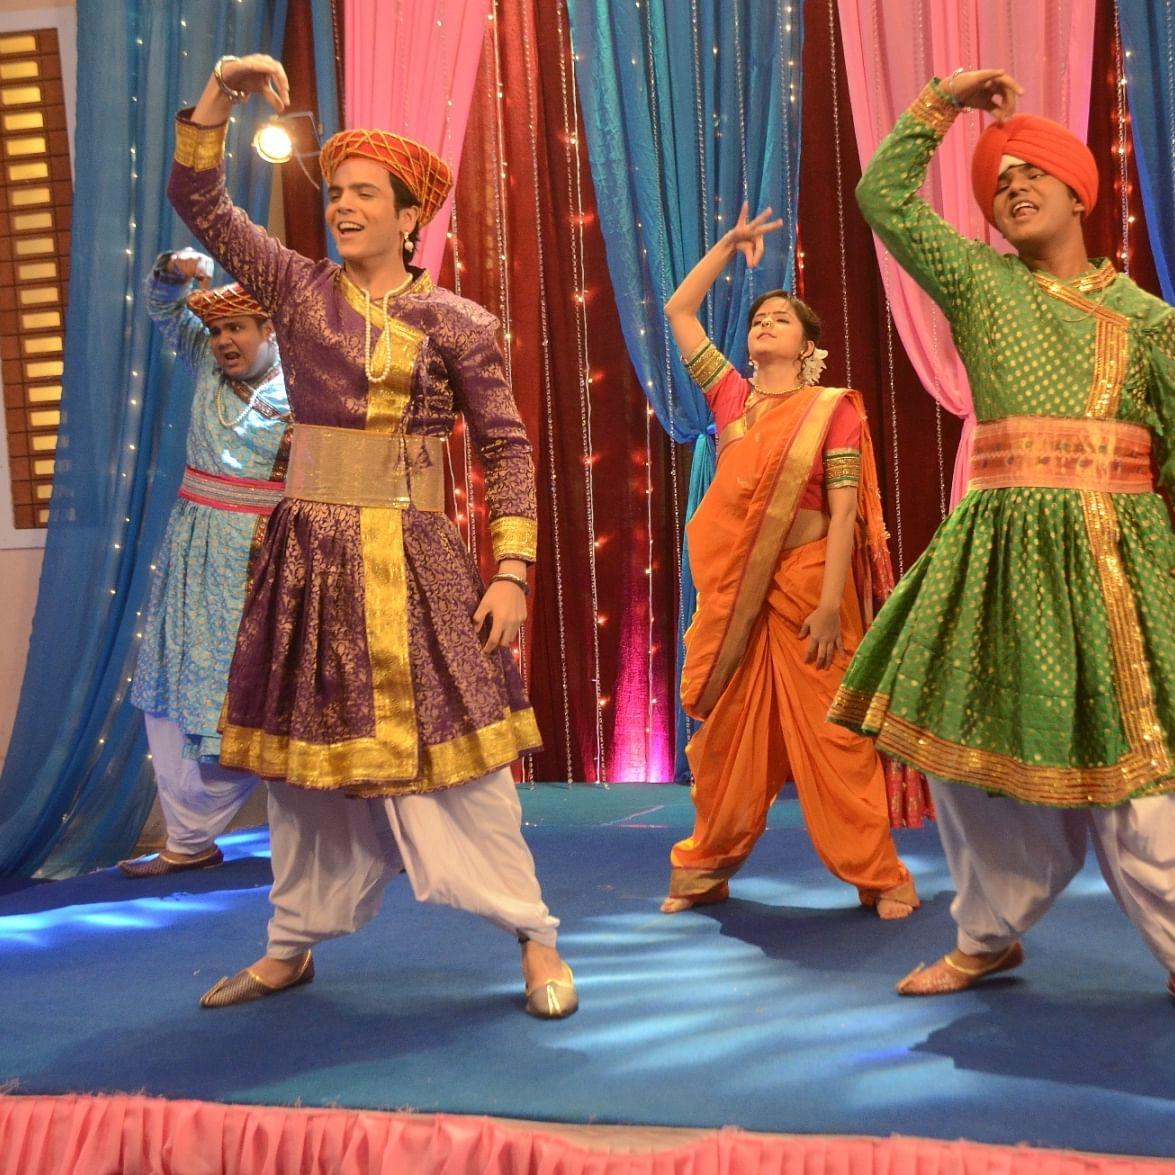 Taarak Mehta Ka Ooltah Chashmah: Tapu sena Entertains Kajol & Ajay Devgan With A Dazzling Dance Performance